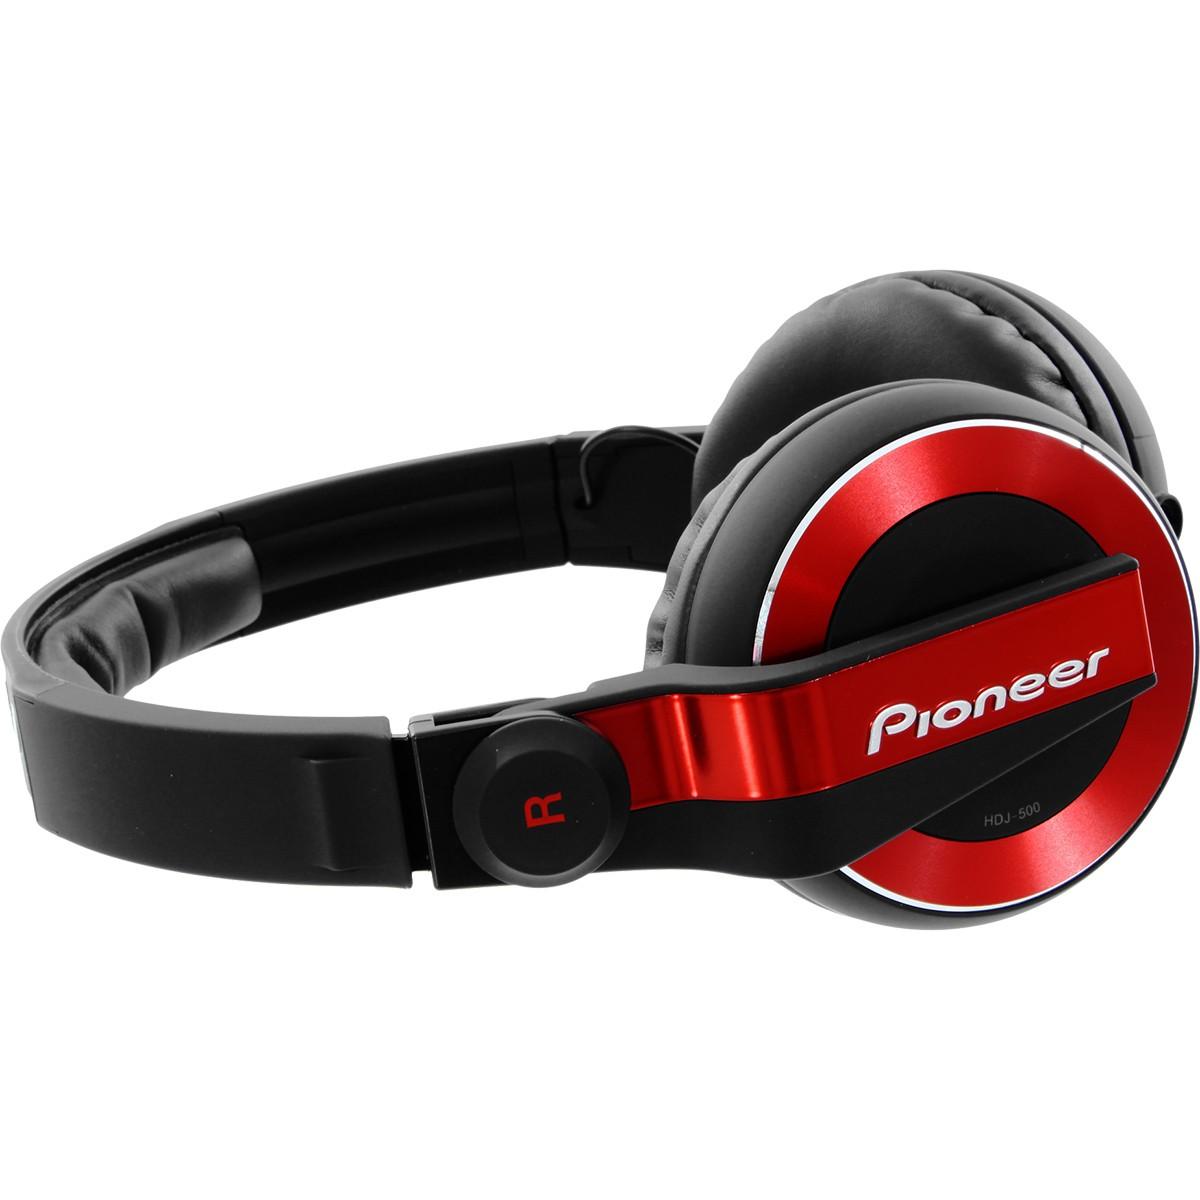 Pioneer HDJ-500 Fone para Dj, Vermelho